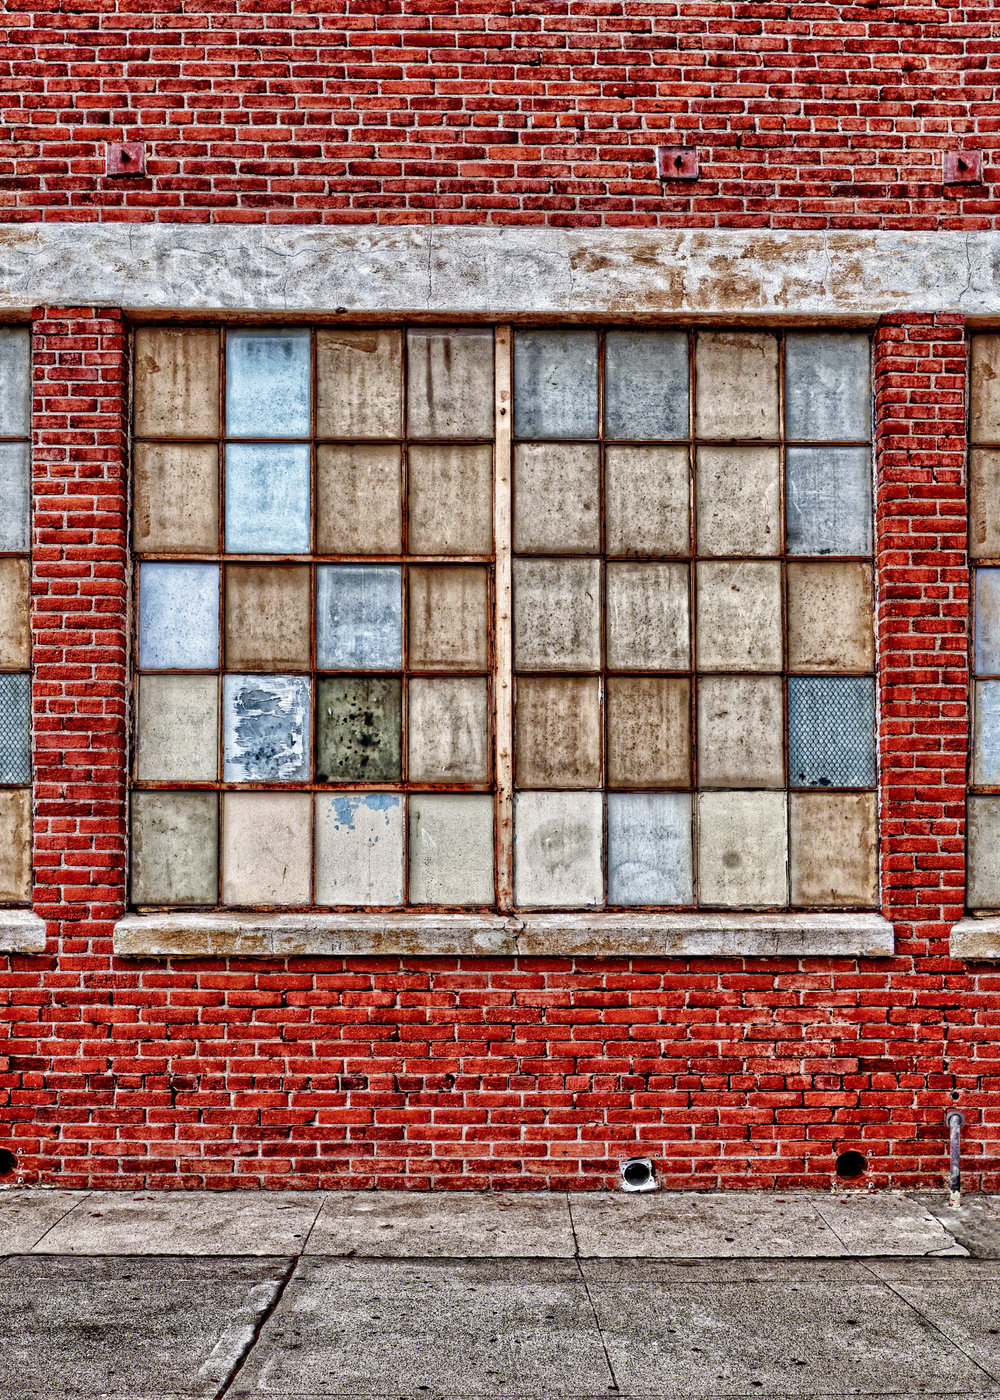 Background I - Grunge Brick Wall